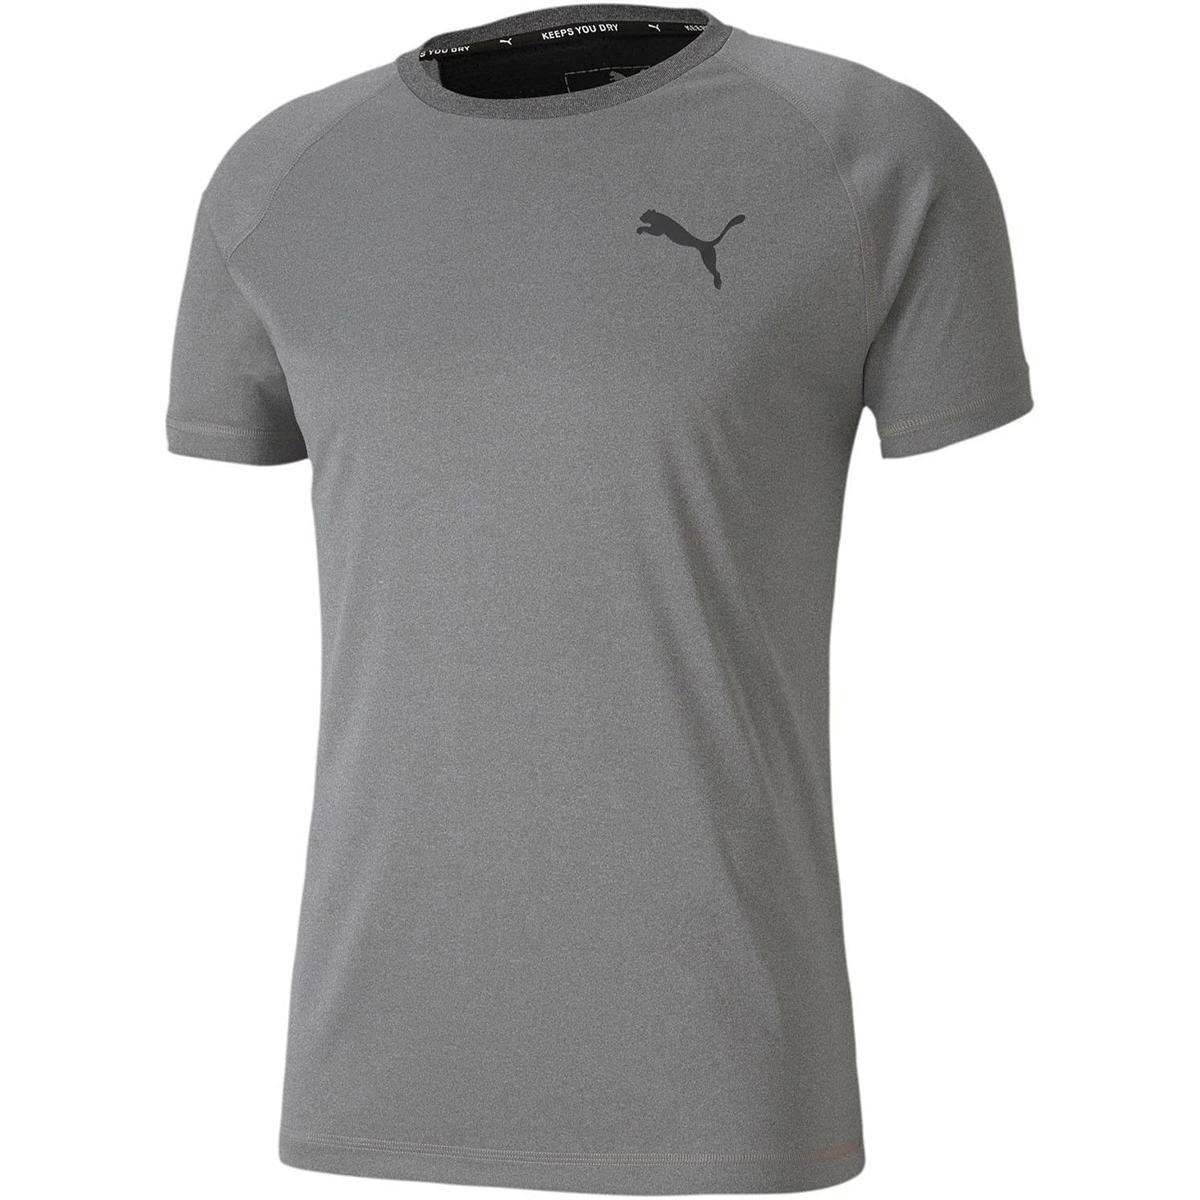 Puma Men's Short-Sleeve Performance Tee - Black, M